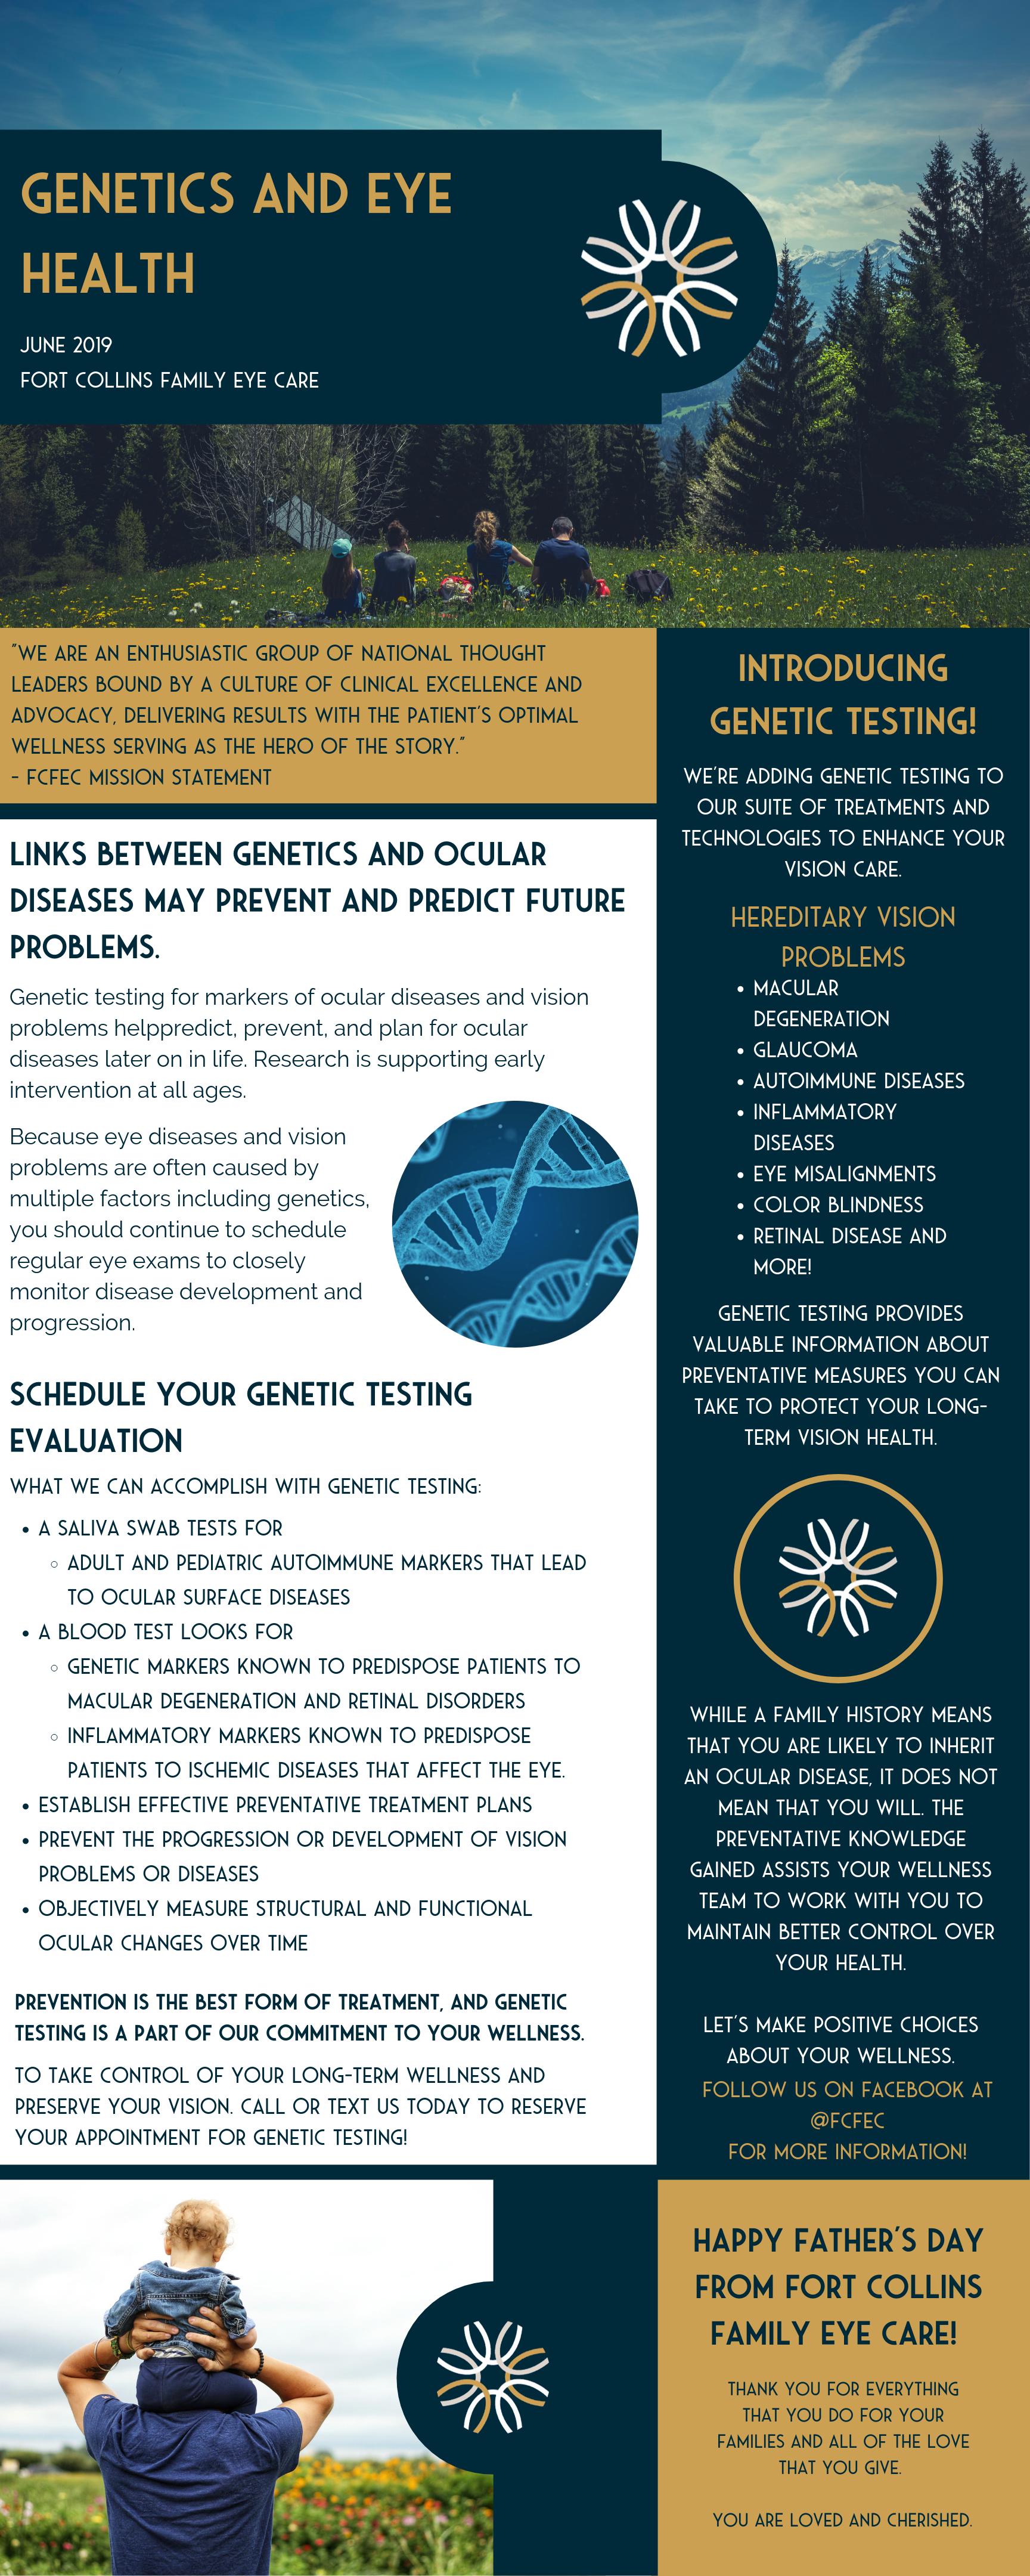 genetics and eye health-9.png